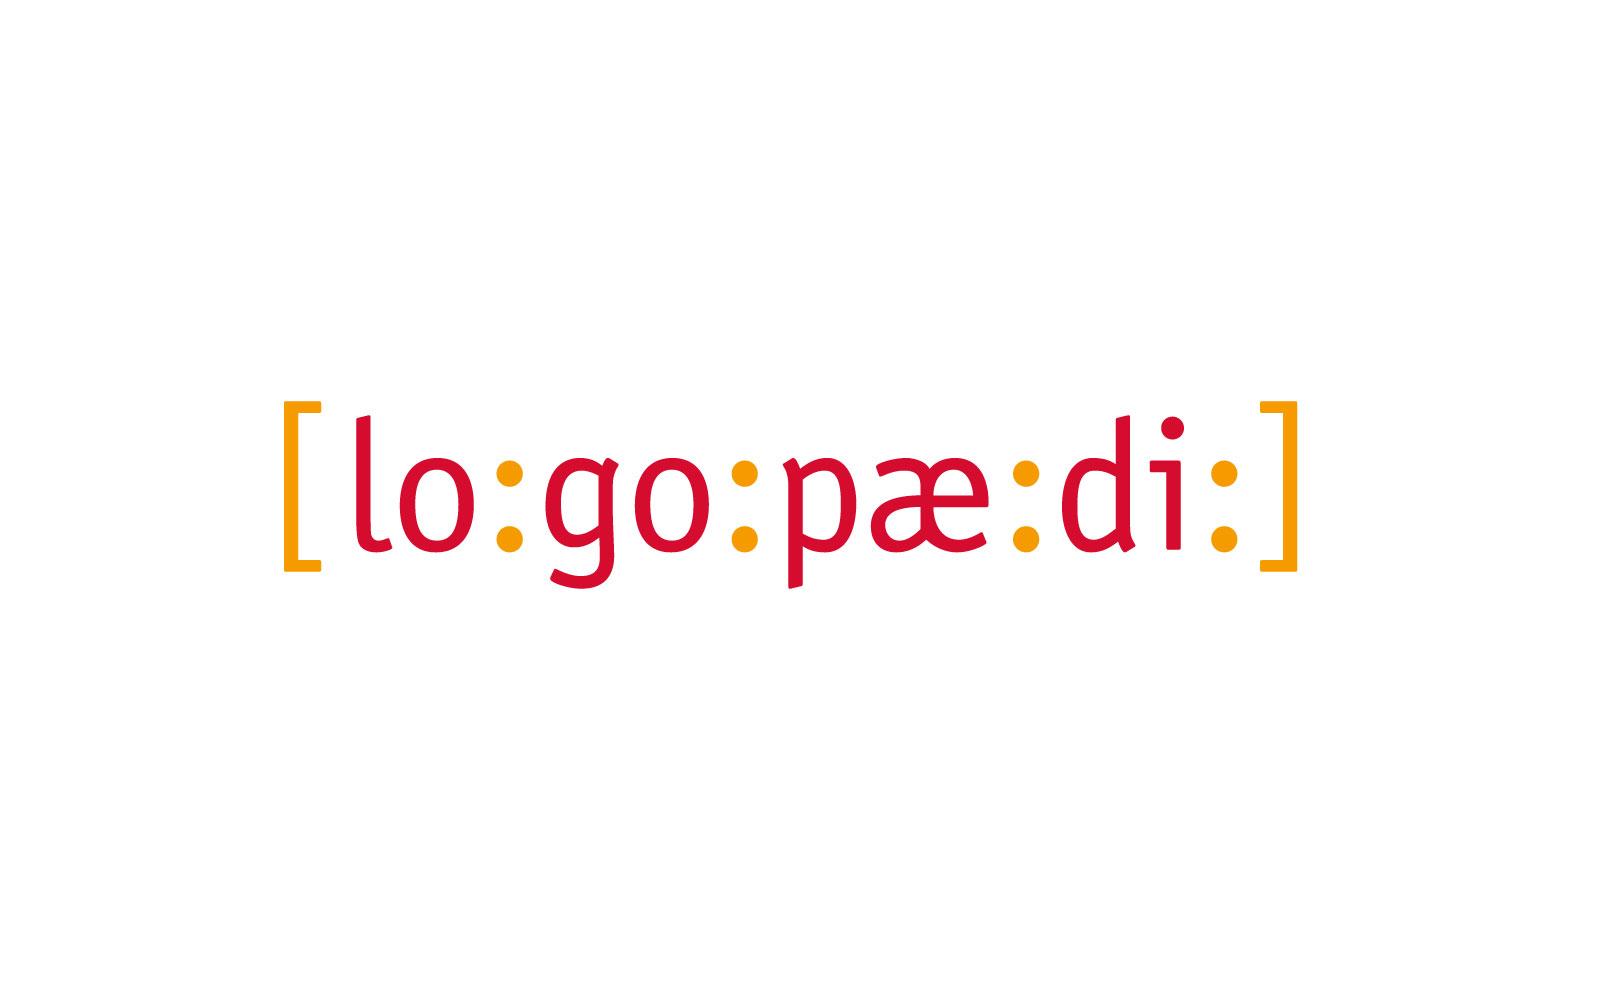 grafiksalon_cd_logopaedie_1600x1000_01